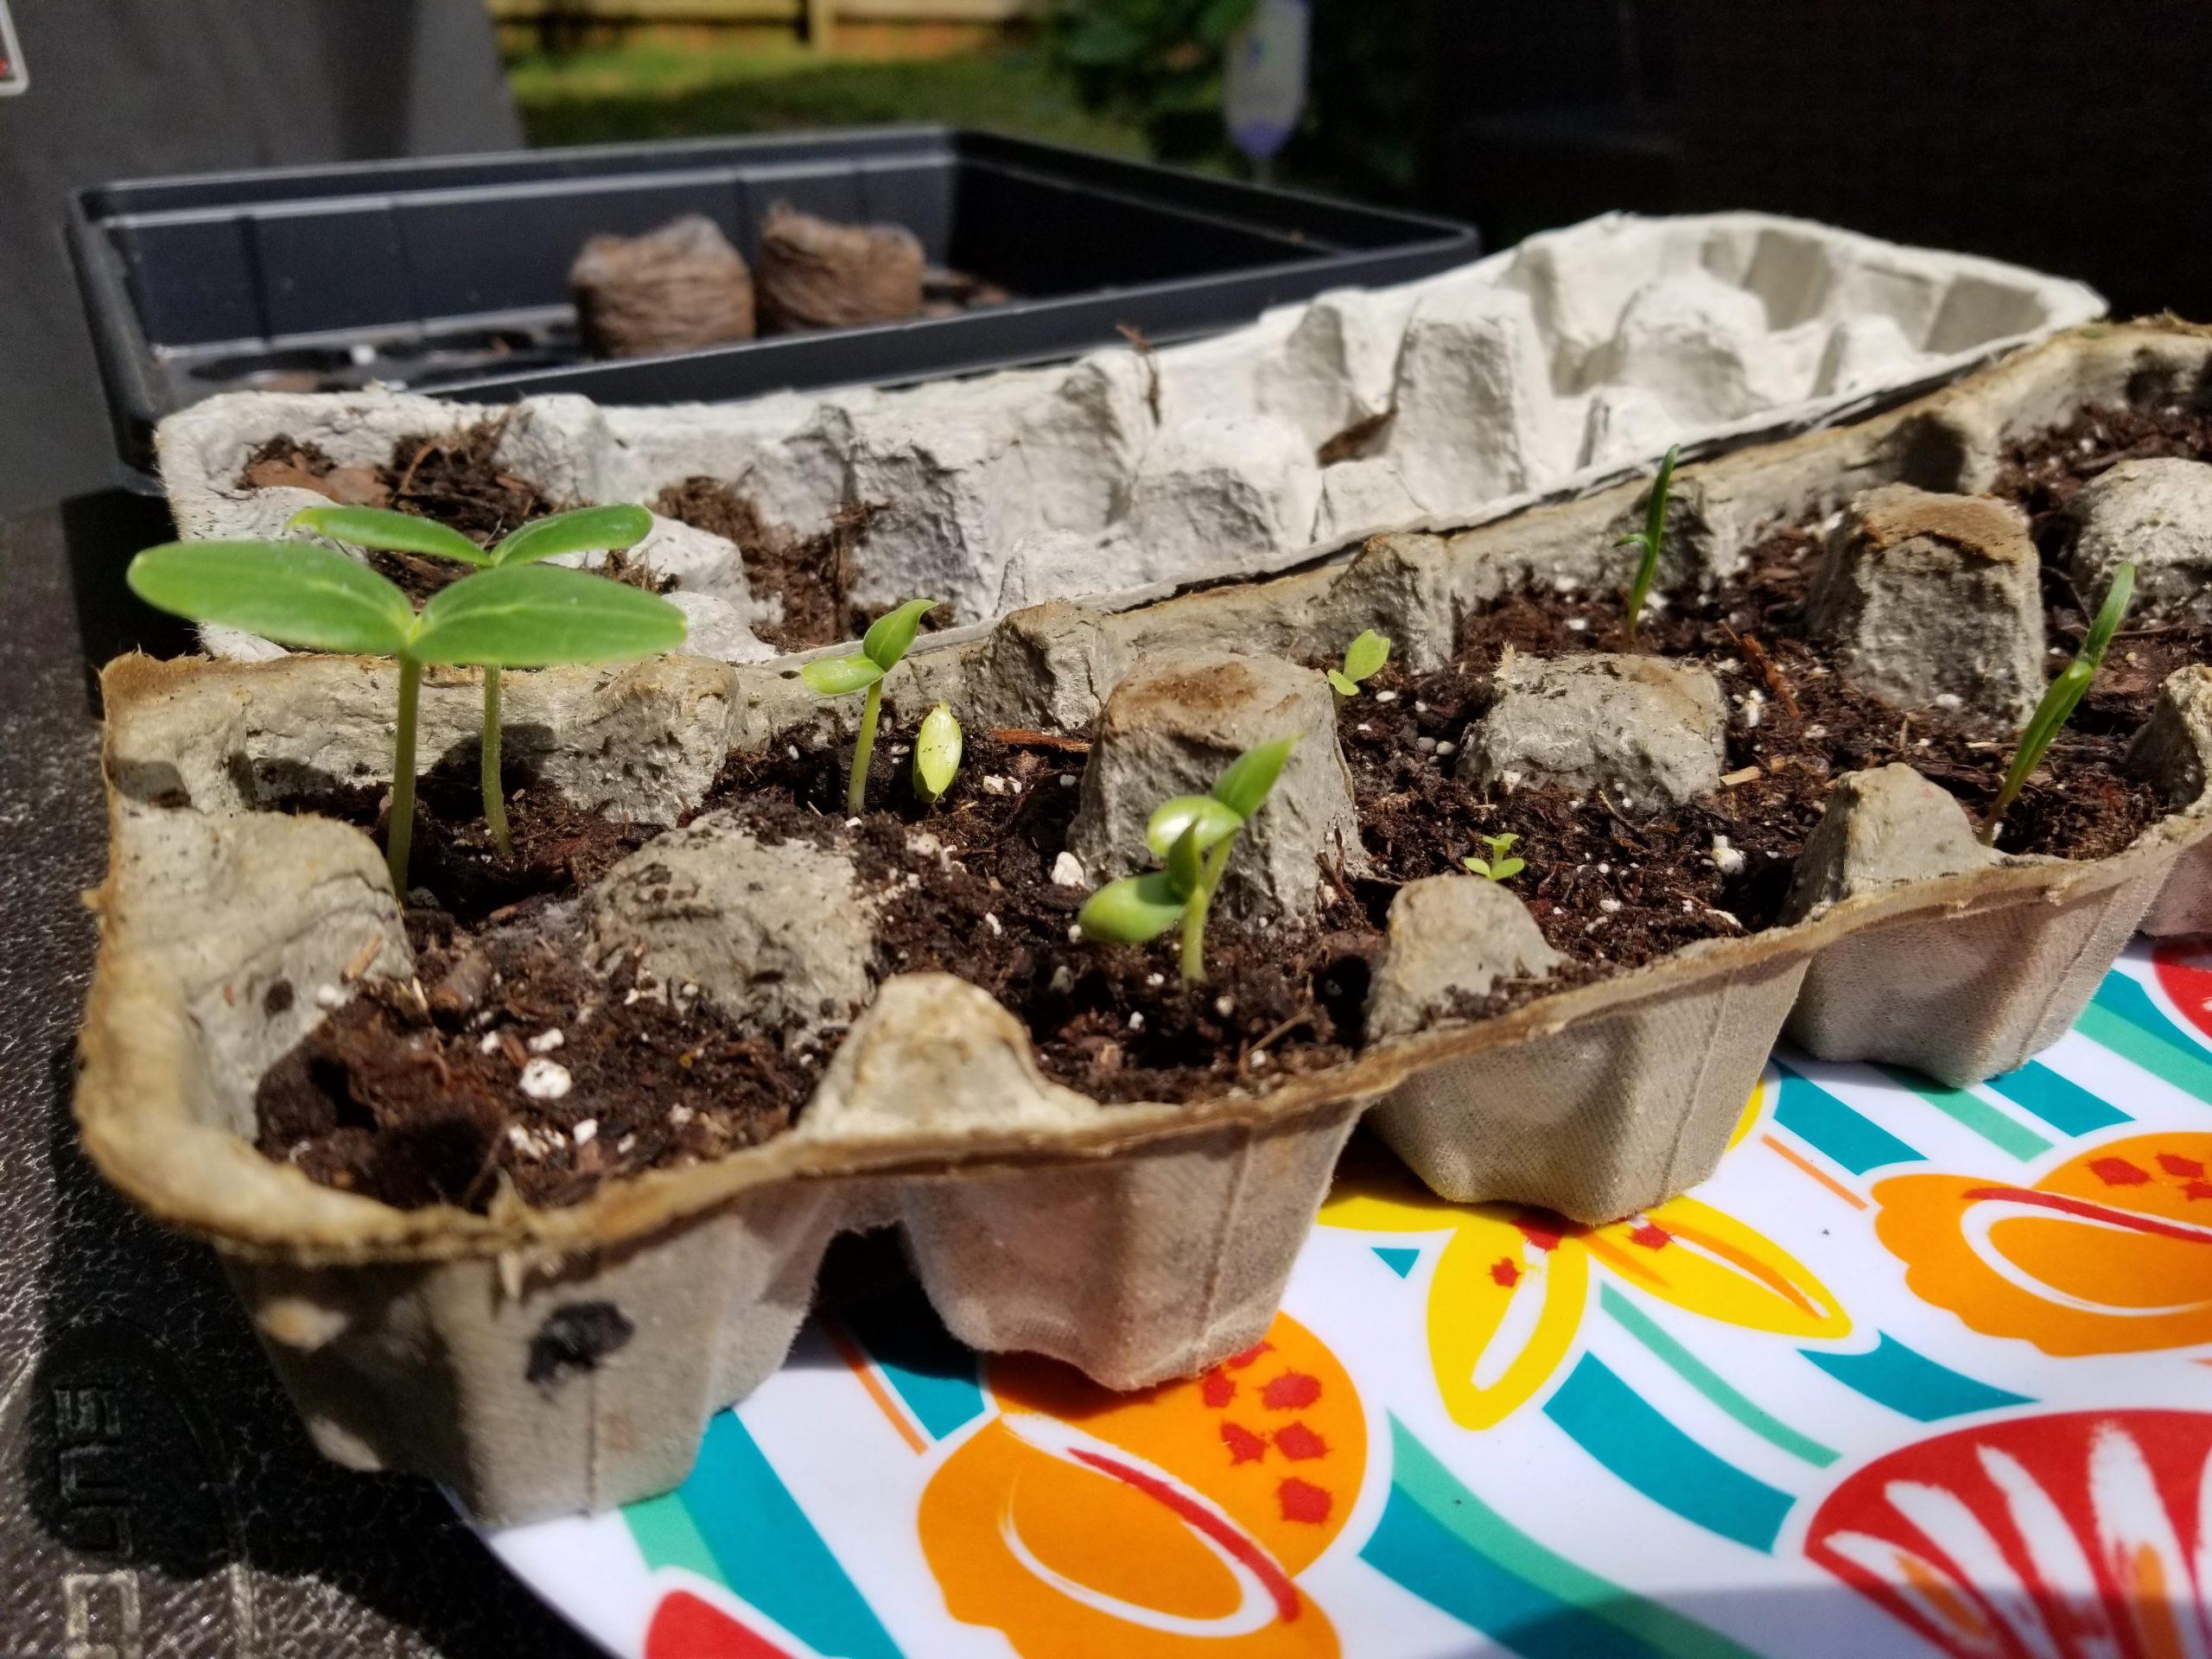 gardening-hack-ste-do-cli